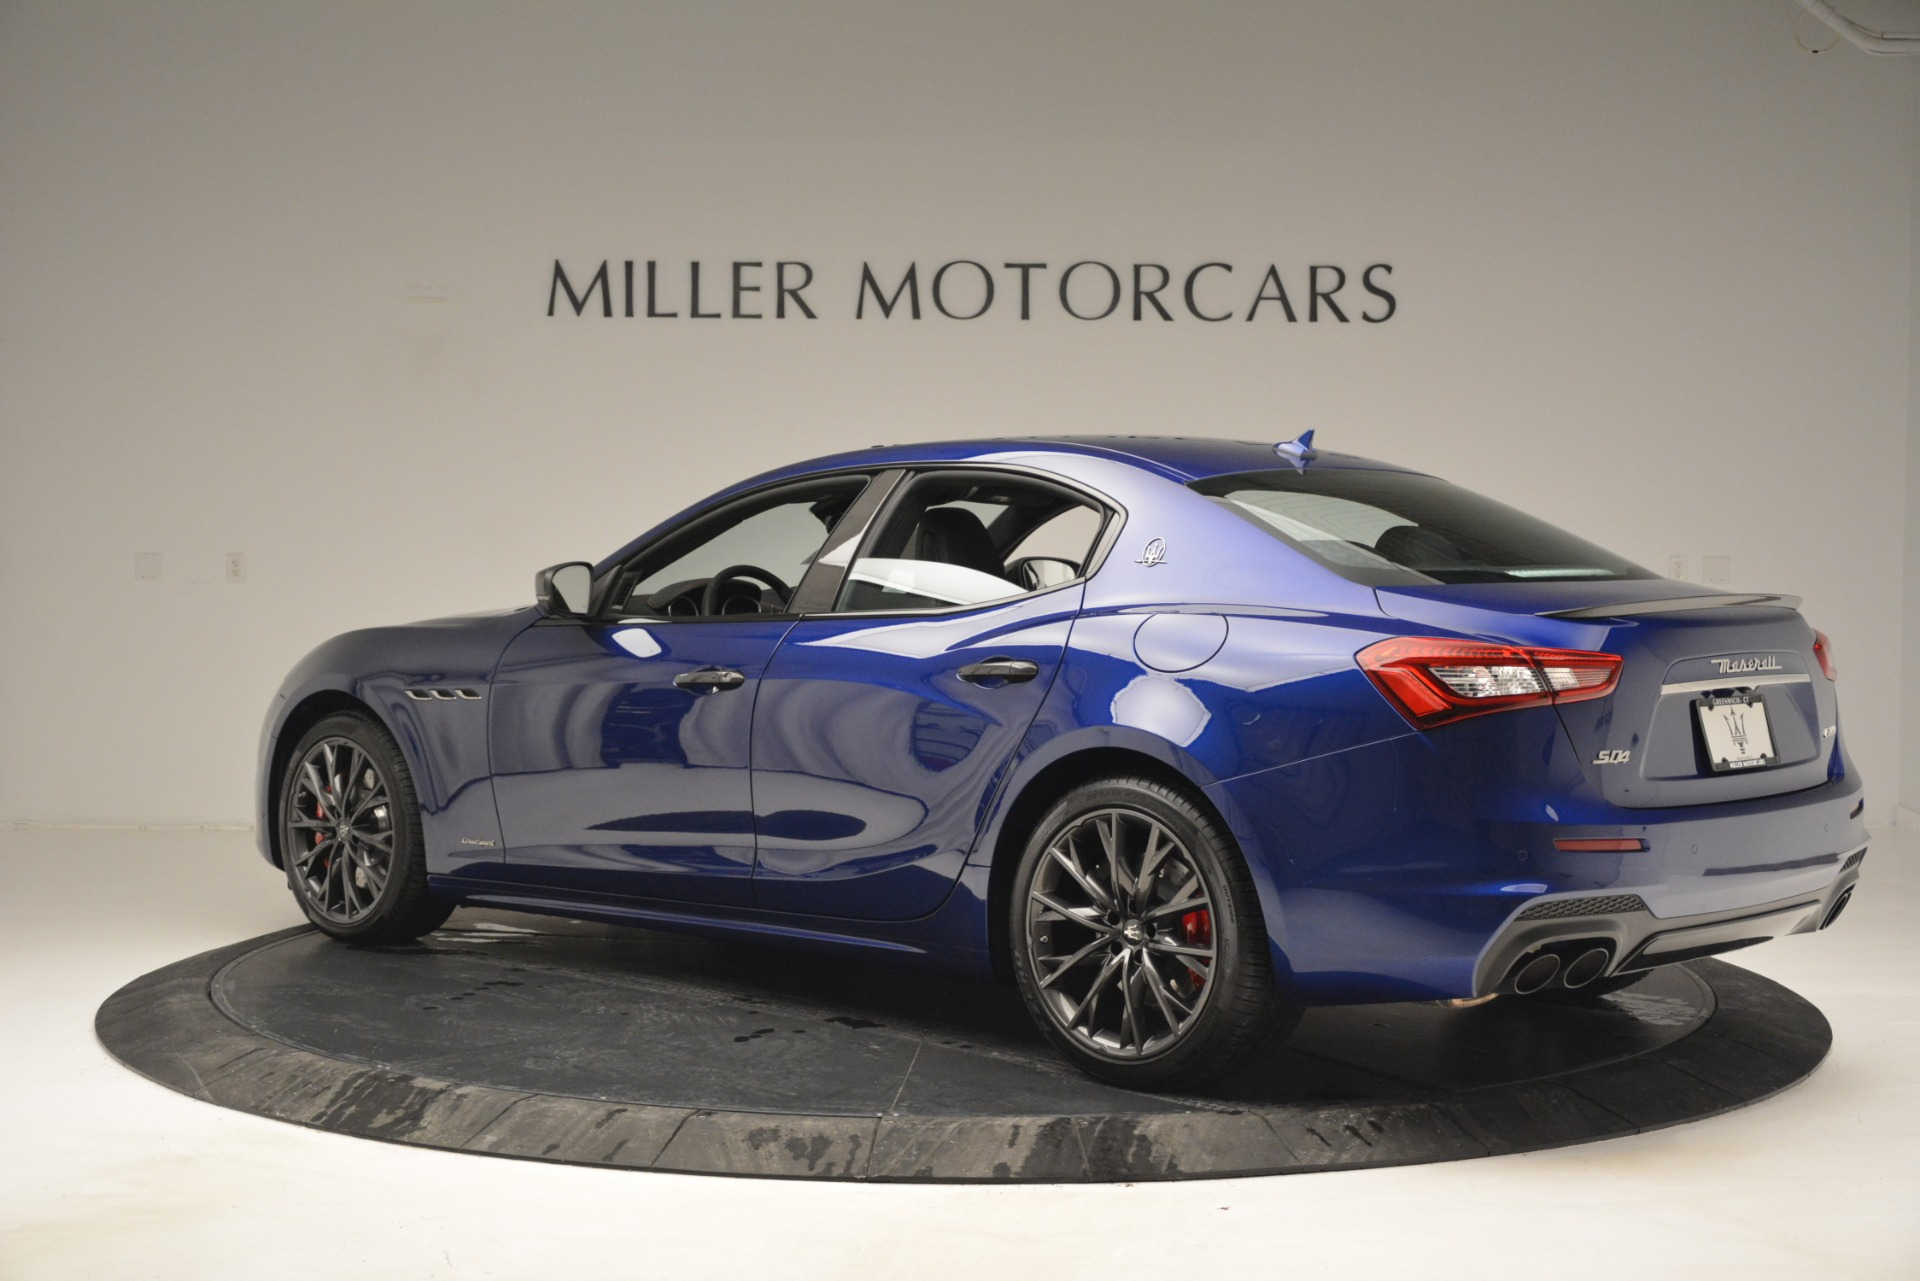 New 2019 Maserati Ghibli S Q4 GranSport For Sale In Greenwich, CT 2978_p4